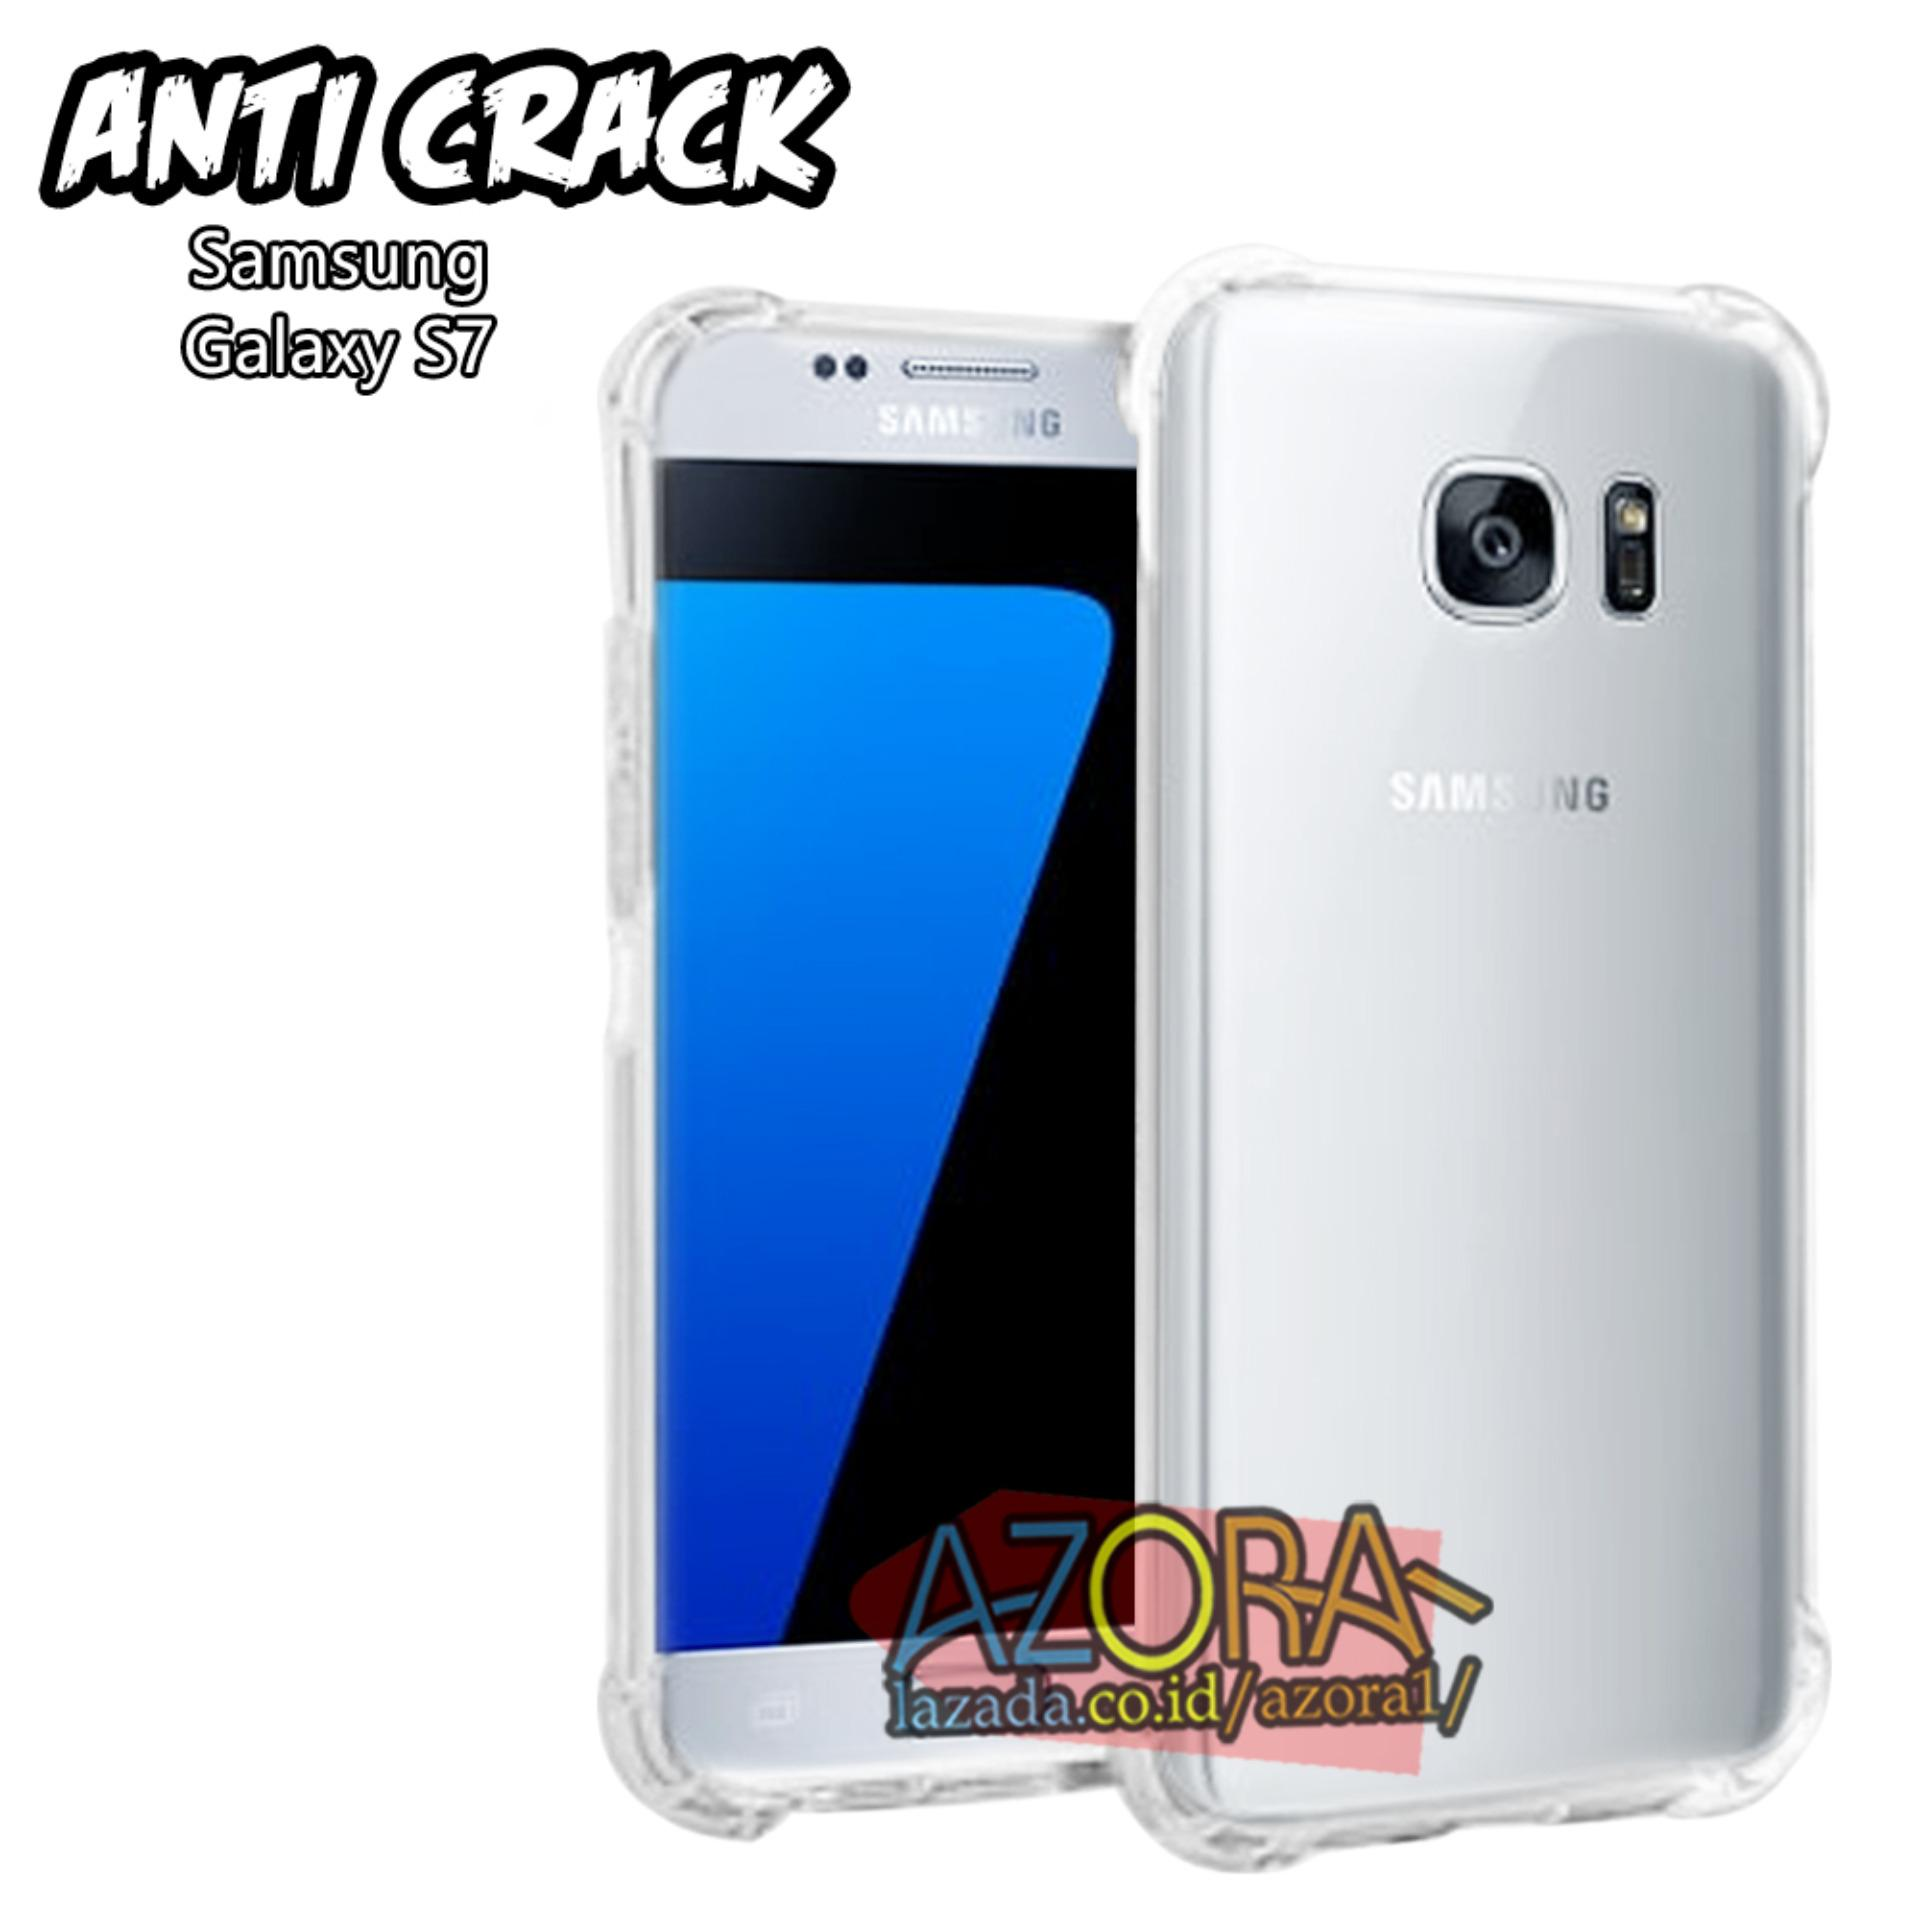 Case Anti Crack Samsung Galaxy S7 Flat Biasa Ultra Thin Anti Shock Jelly Silikon Shockproof Softcase Azora - Bening